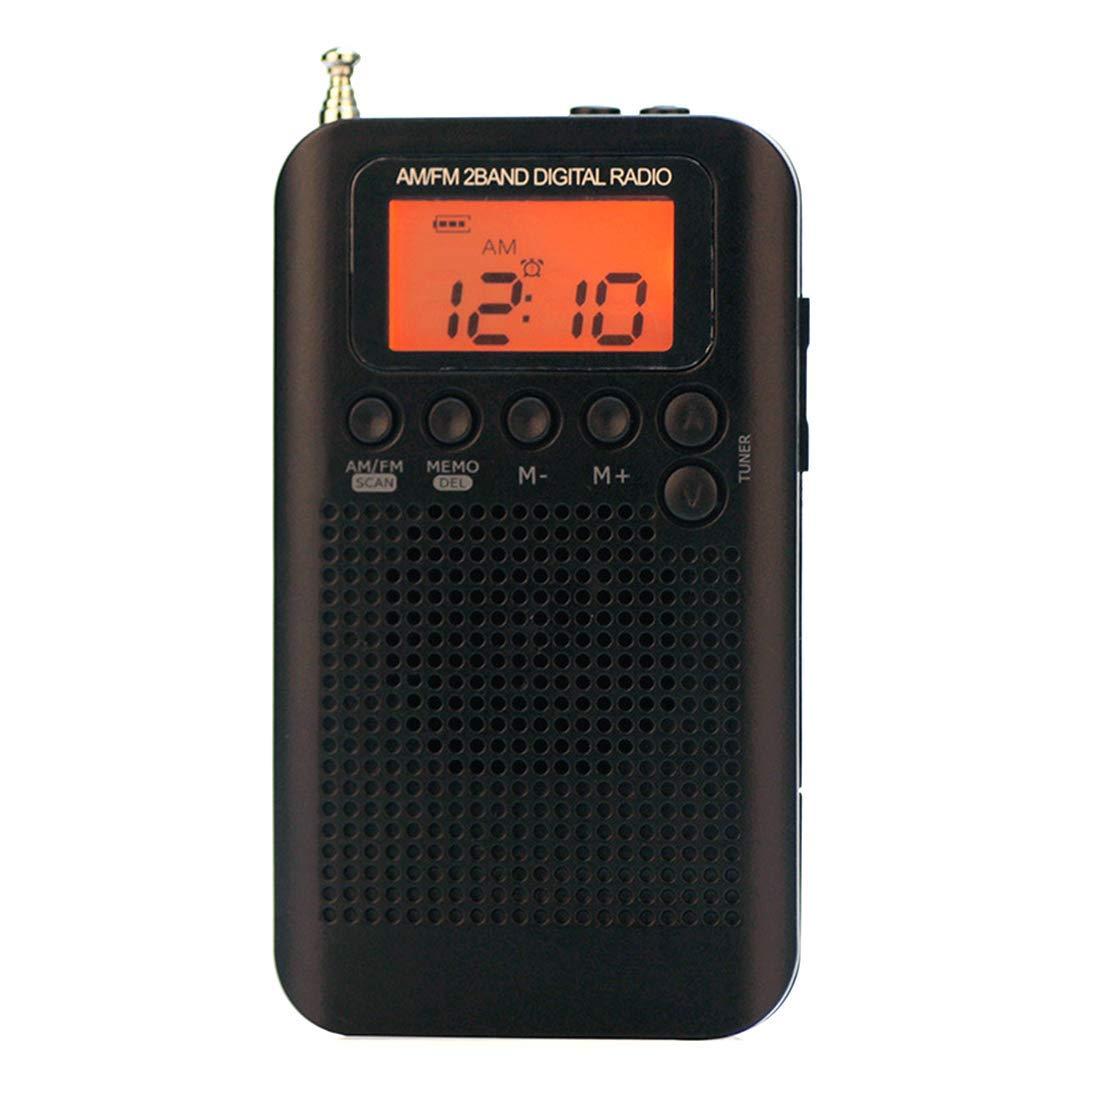 ac4e4bd614ba Get Quotations · AM/FM Portable Mini Pocket Digital Radio AM FM Switch  Personal Transistor Radio Player Built